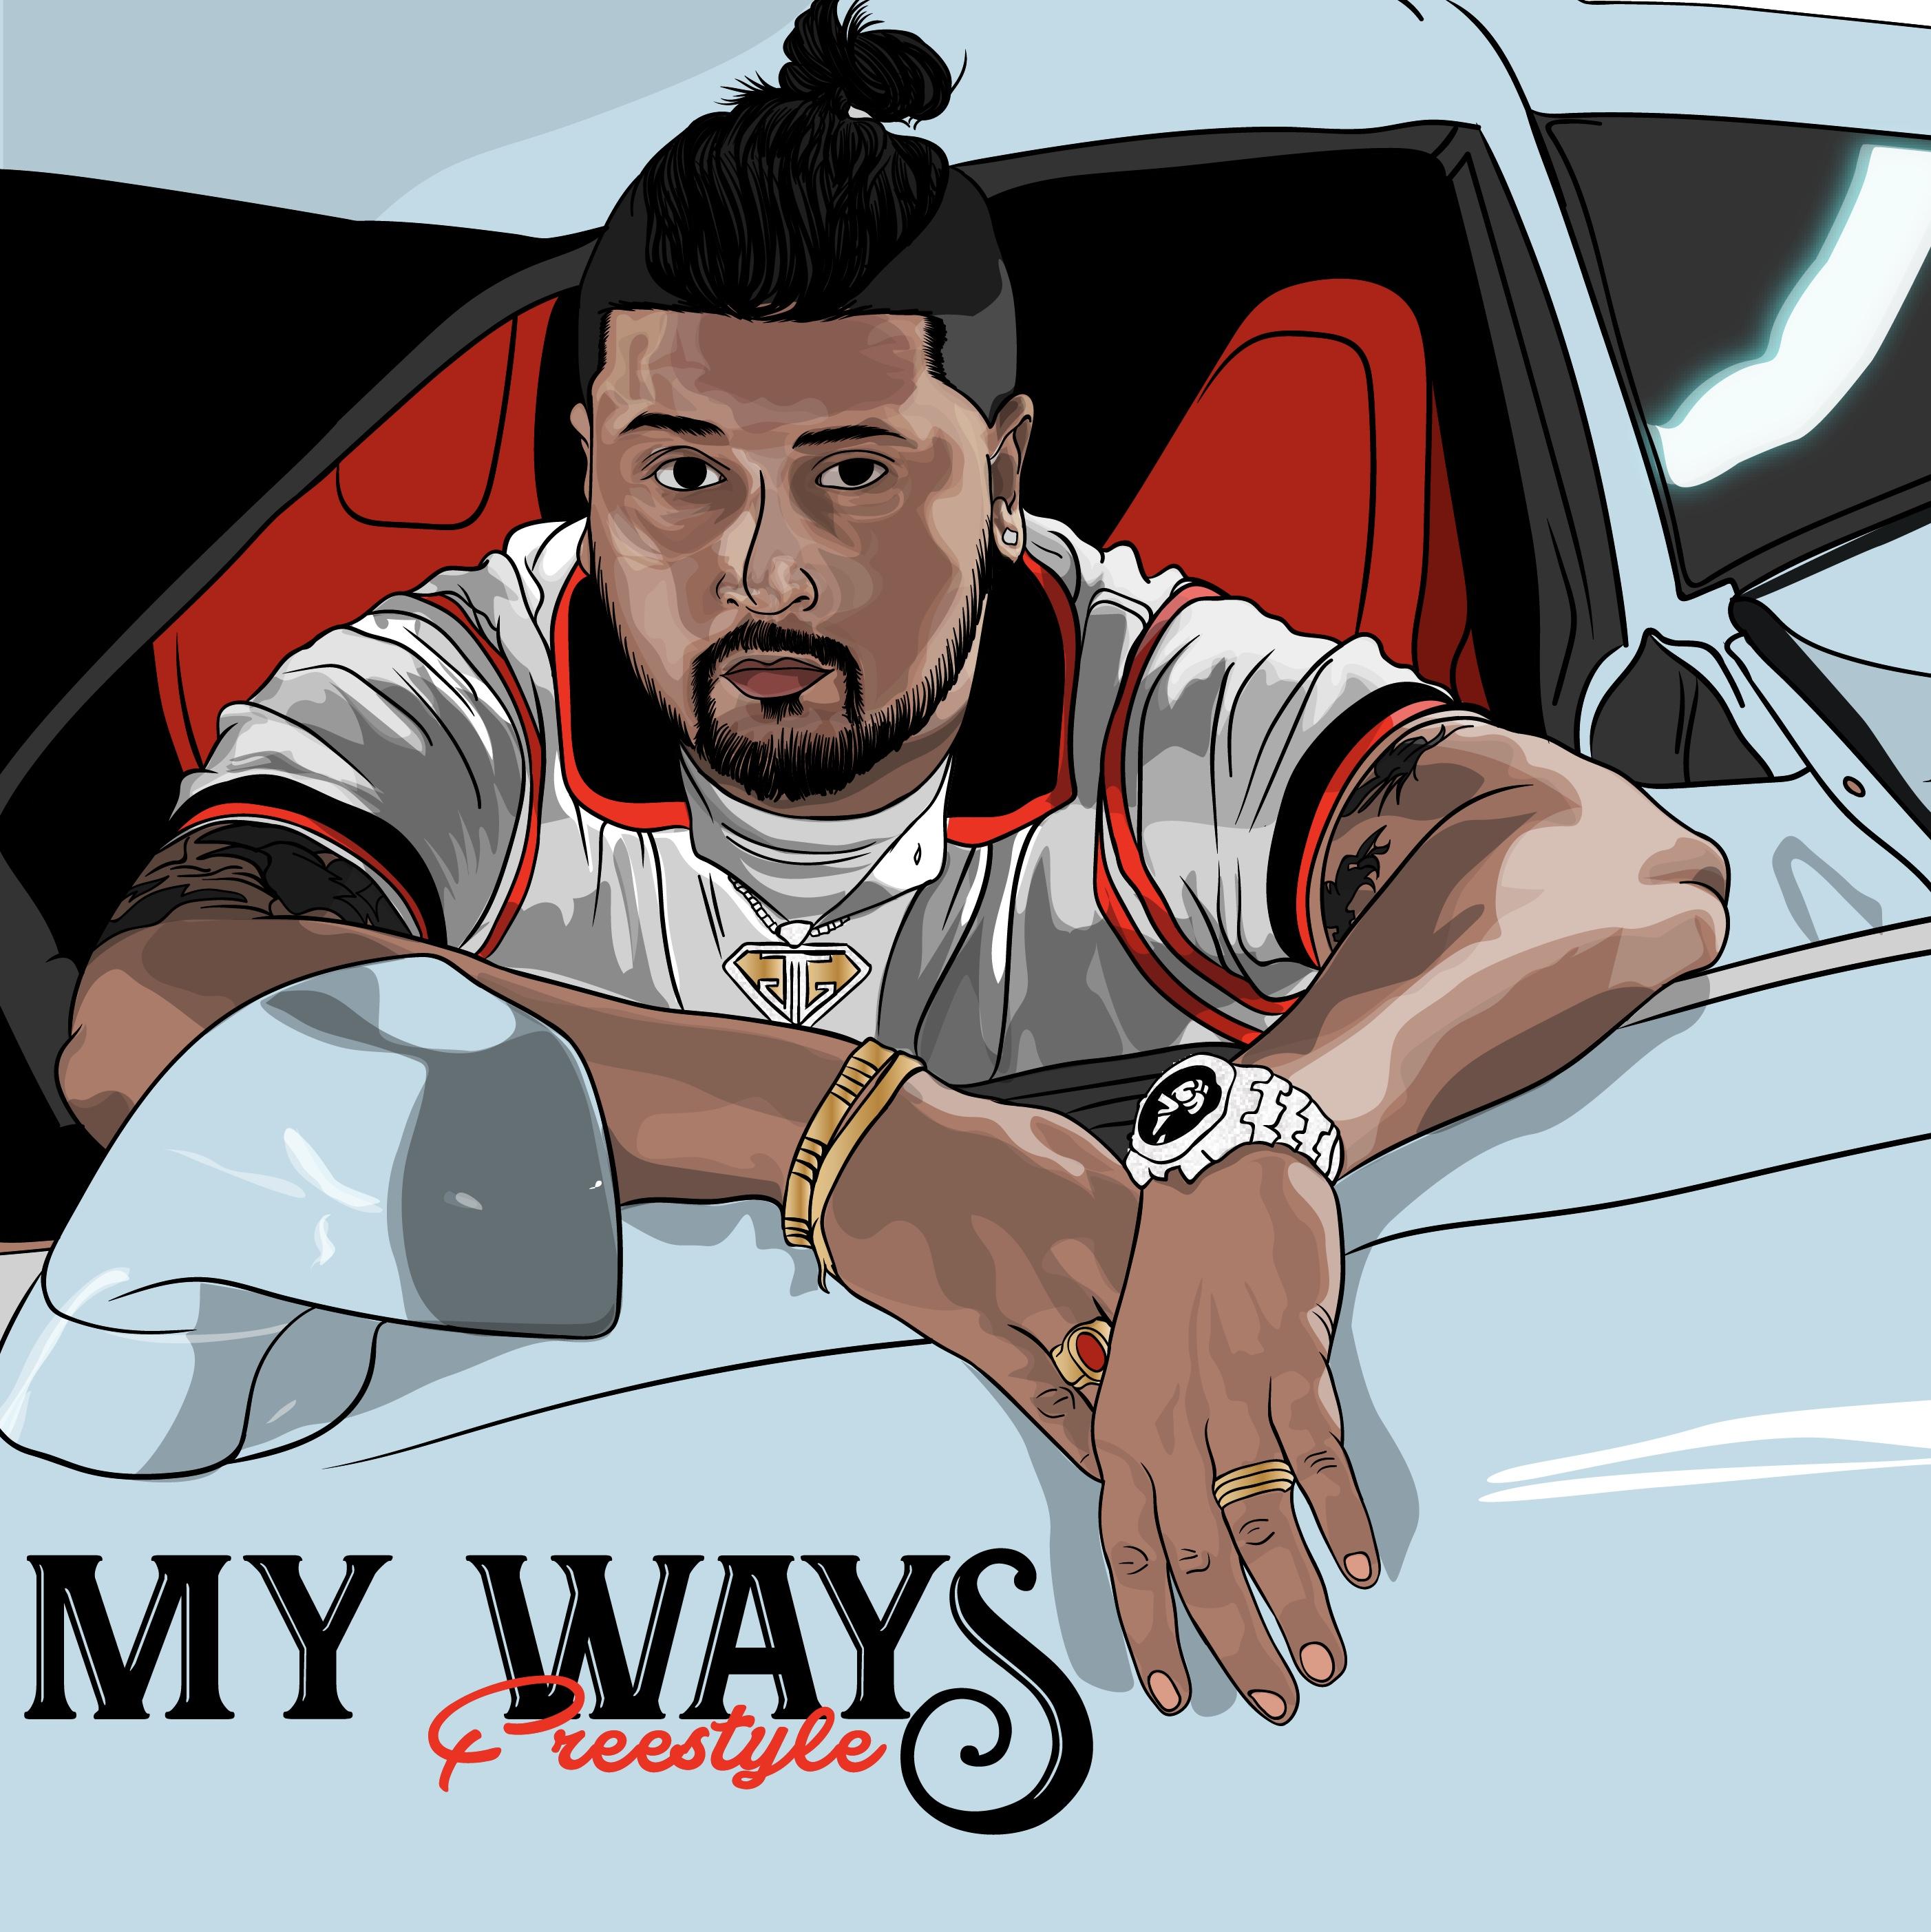 My Ways (Freestyle)